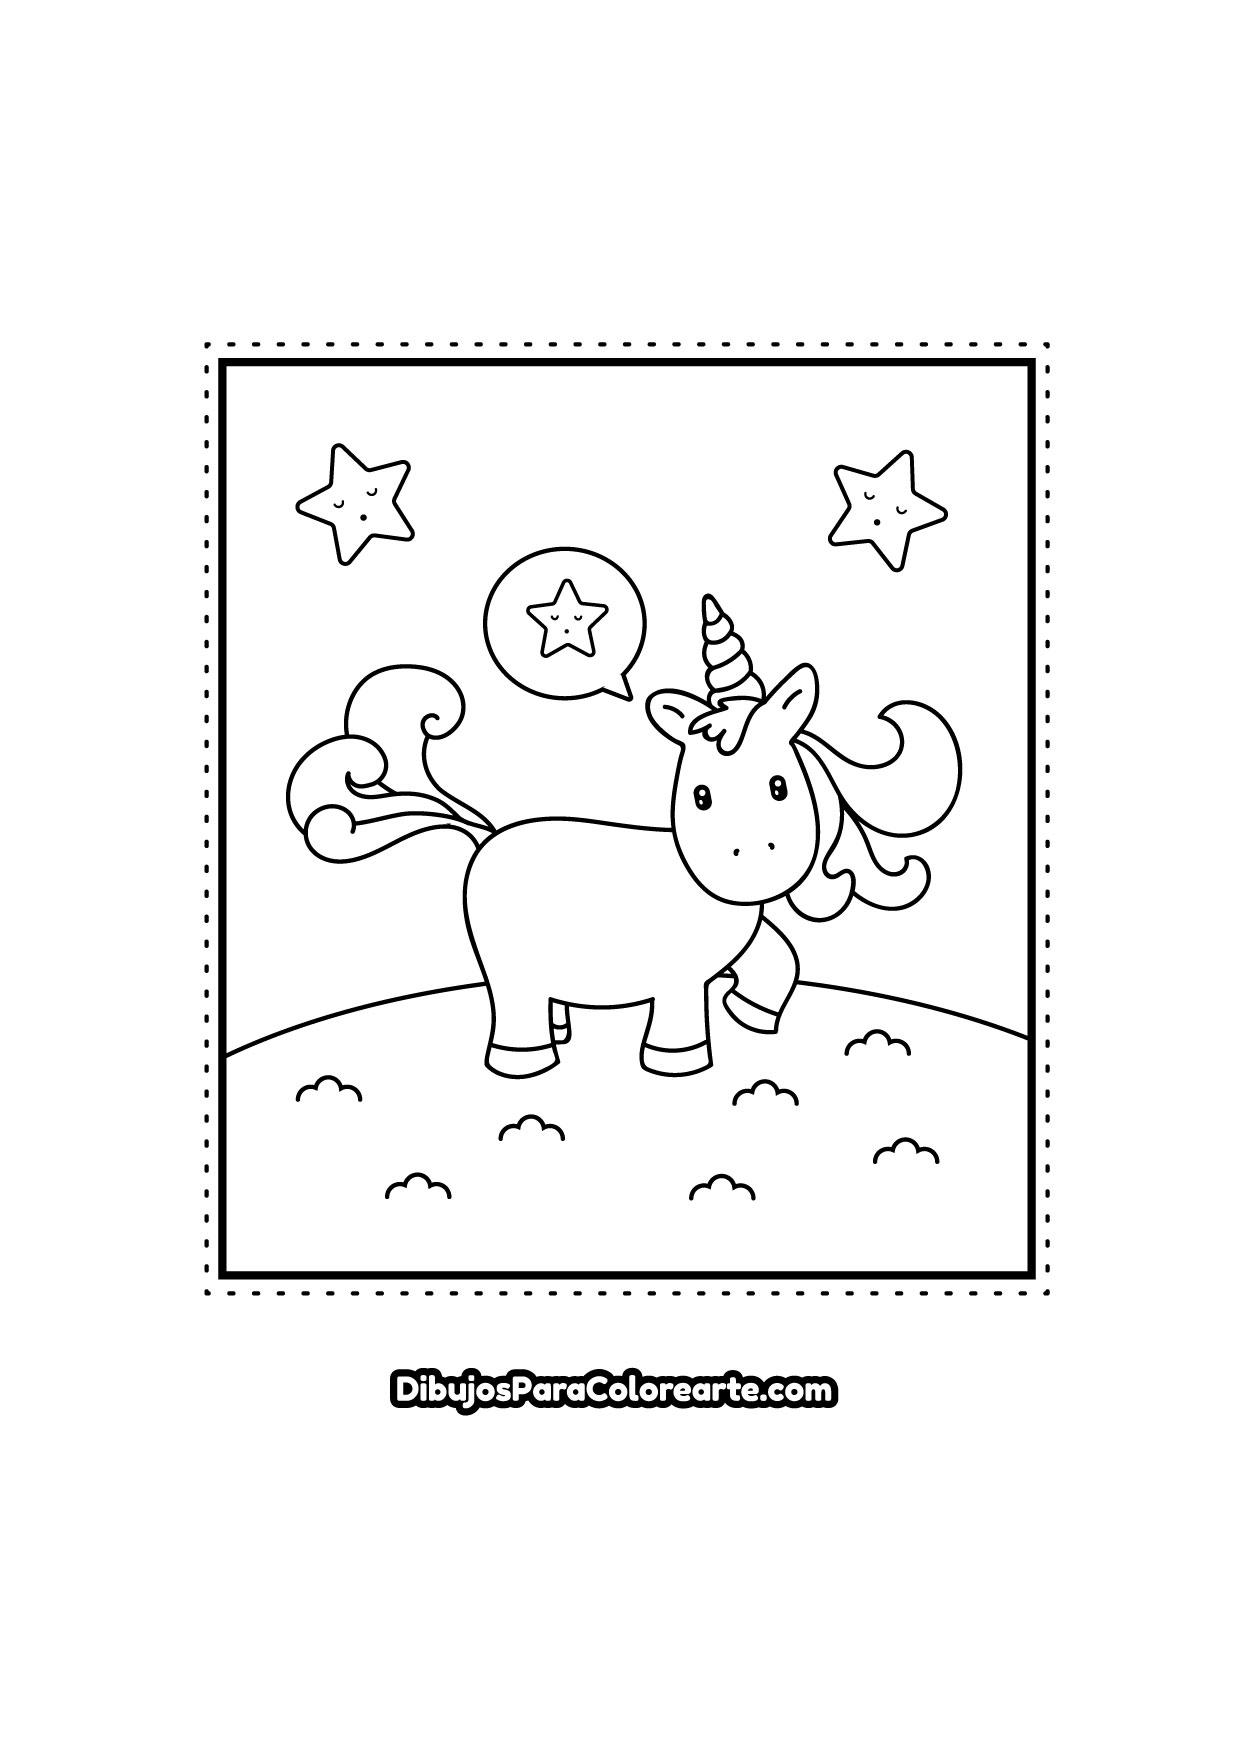 Pintar Dibujo Fácil De Unicornio Kawaii